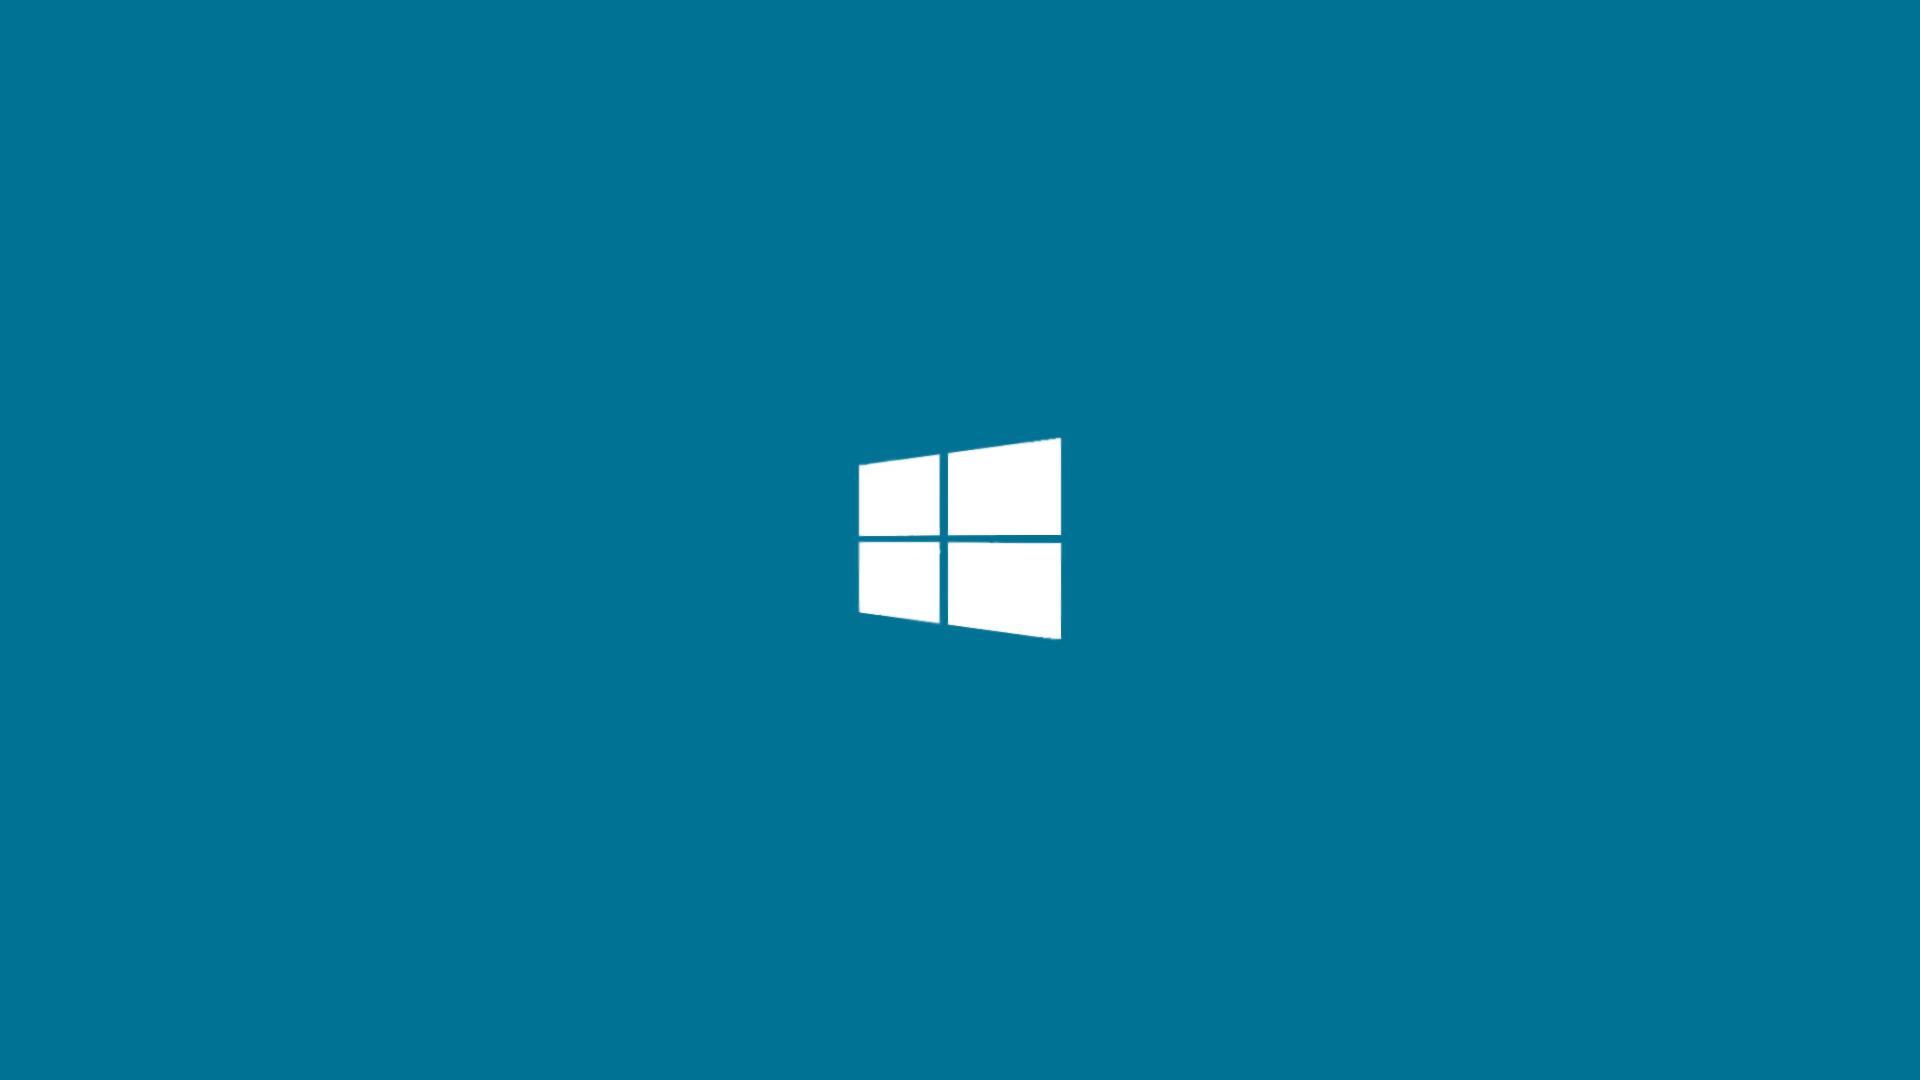 Microsoft Wallpaper Tag Amazing Wallpaperz Download